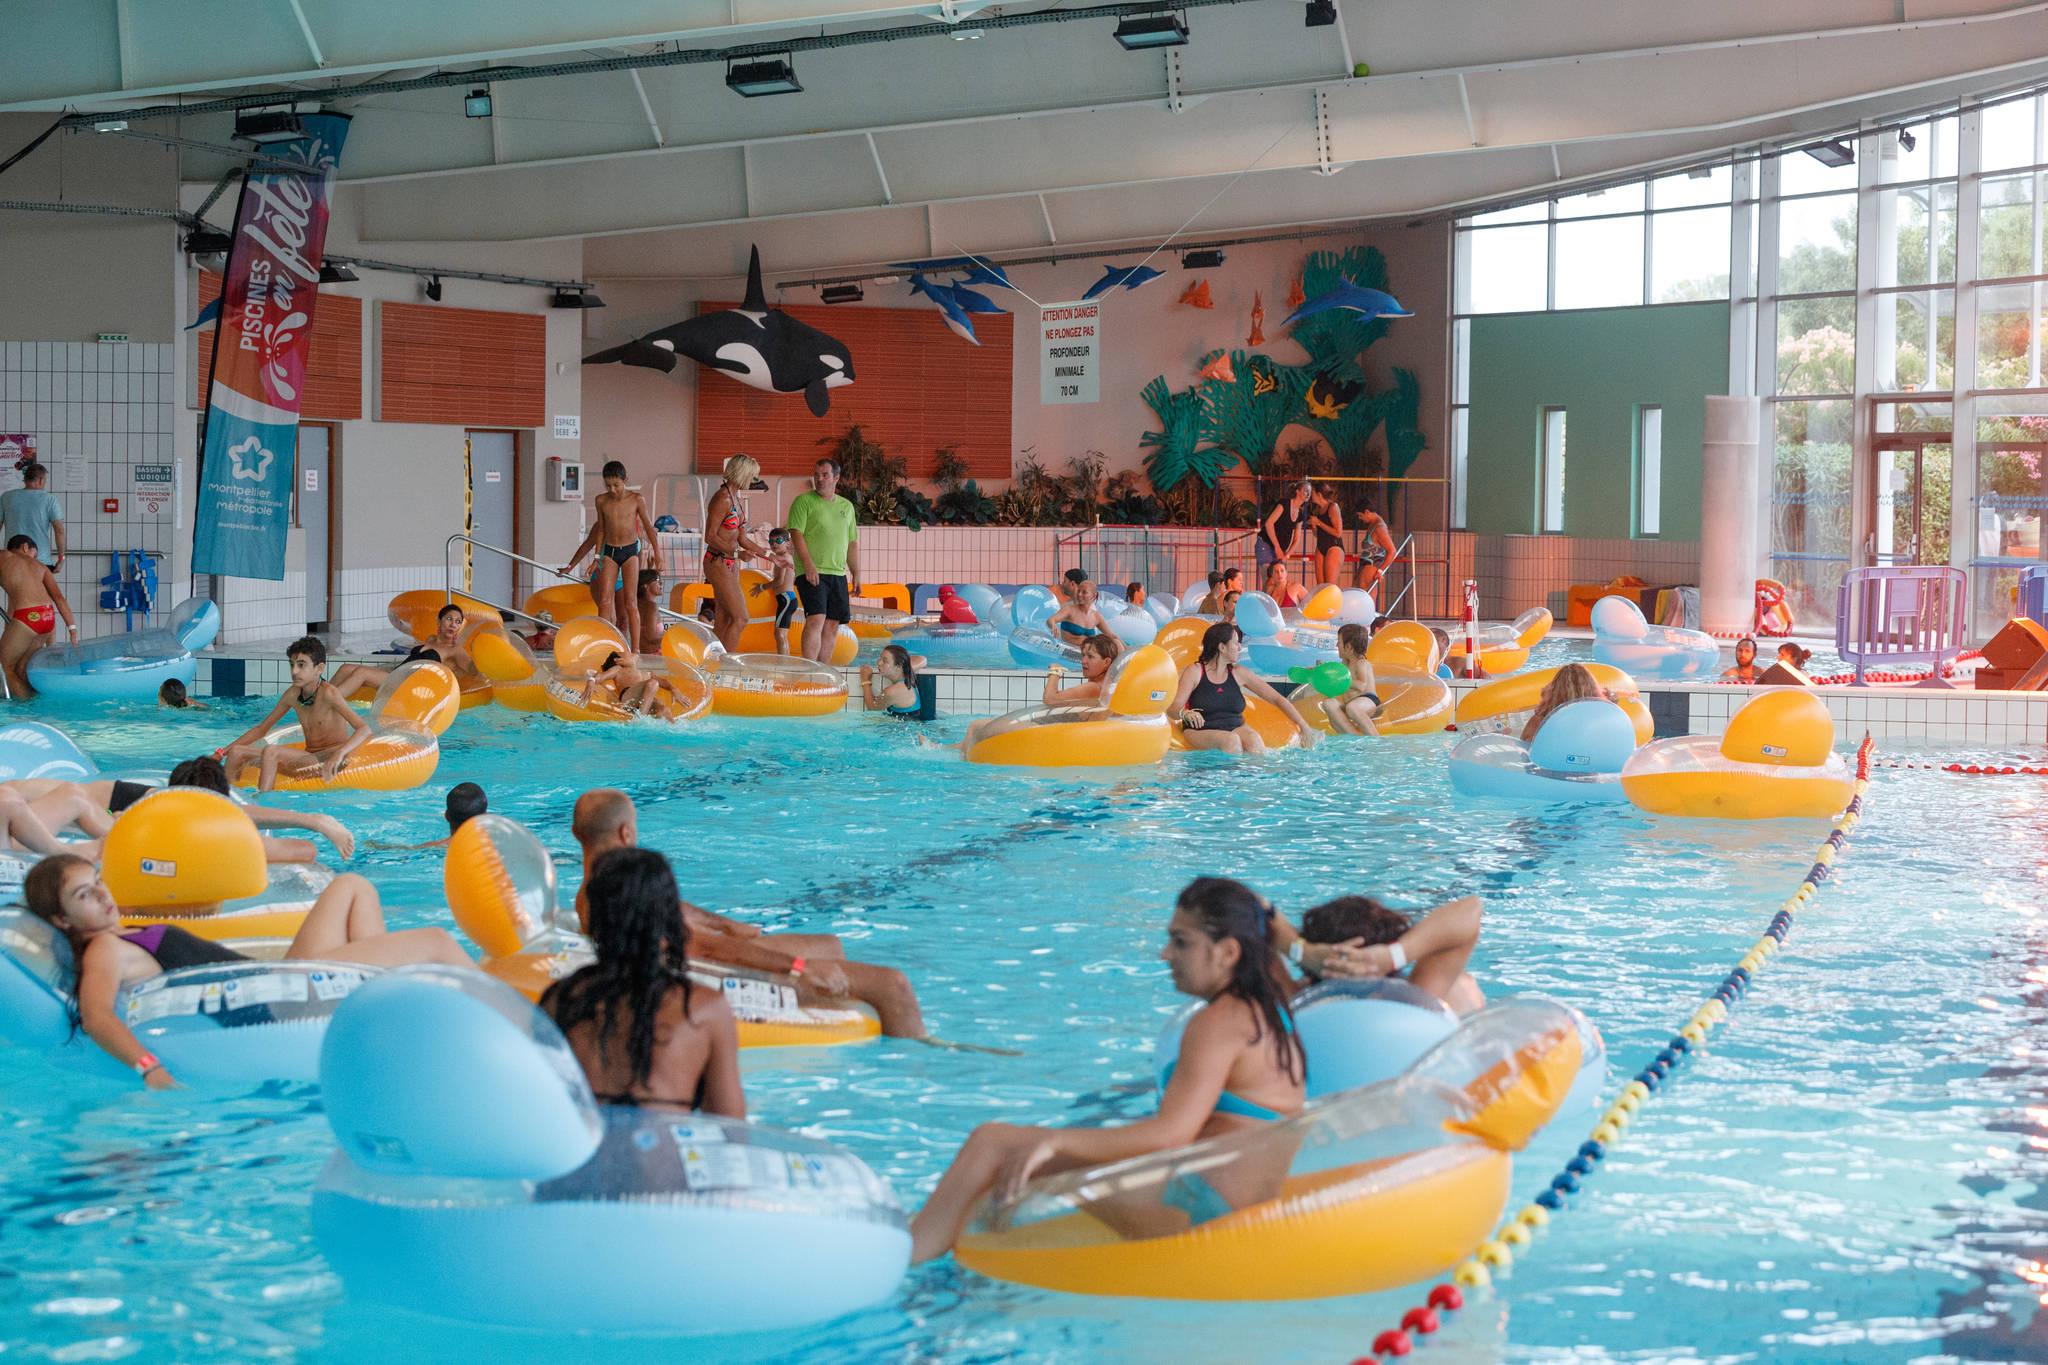 Piscine Amphitrite, Swimming-Pool - Montpellier Tourist Office tout Piscine Originale